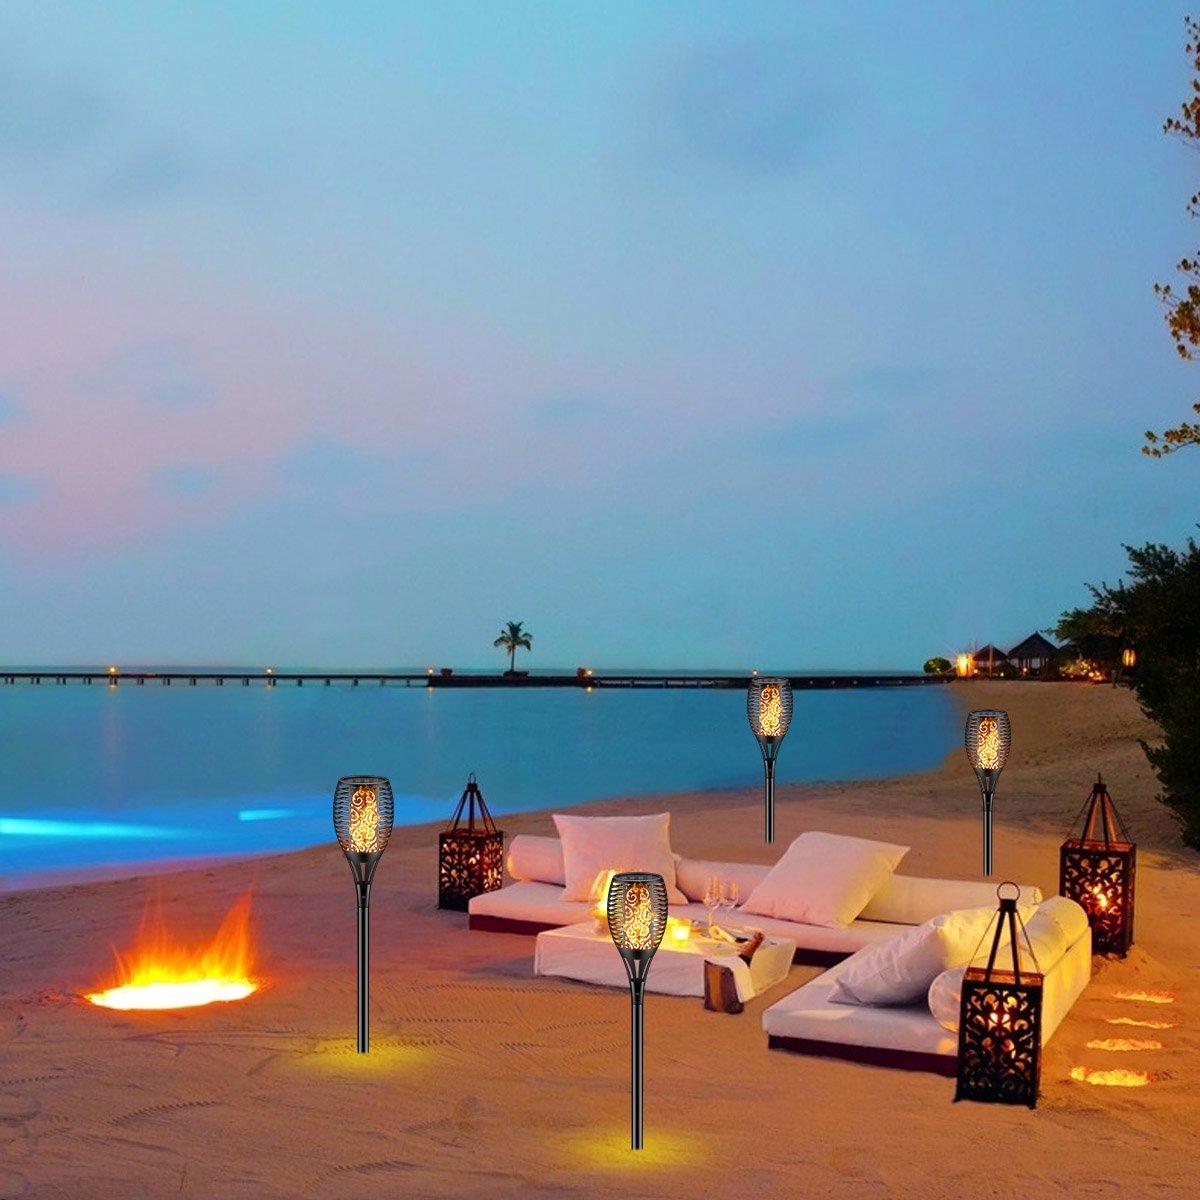 Solar Torch Light with Flickering Flame,Fire Effect Lantern,Dancing Flame,Solar Garden Light, Dust to Dawn,Outdoor Waterproof Garden Decoration, Solar Powered Stick Light ZKEE(Set of 4) by zkee (Image #6)